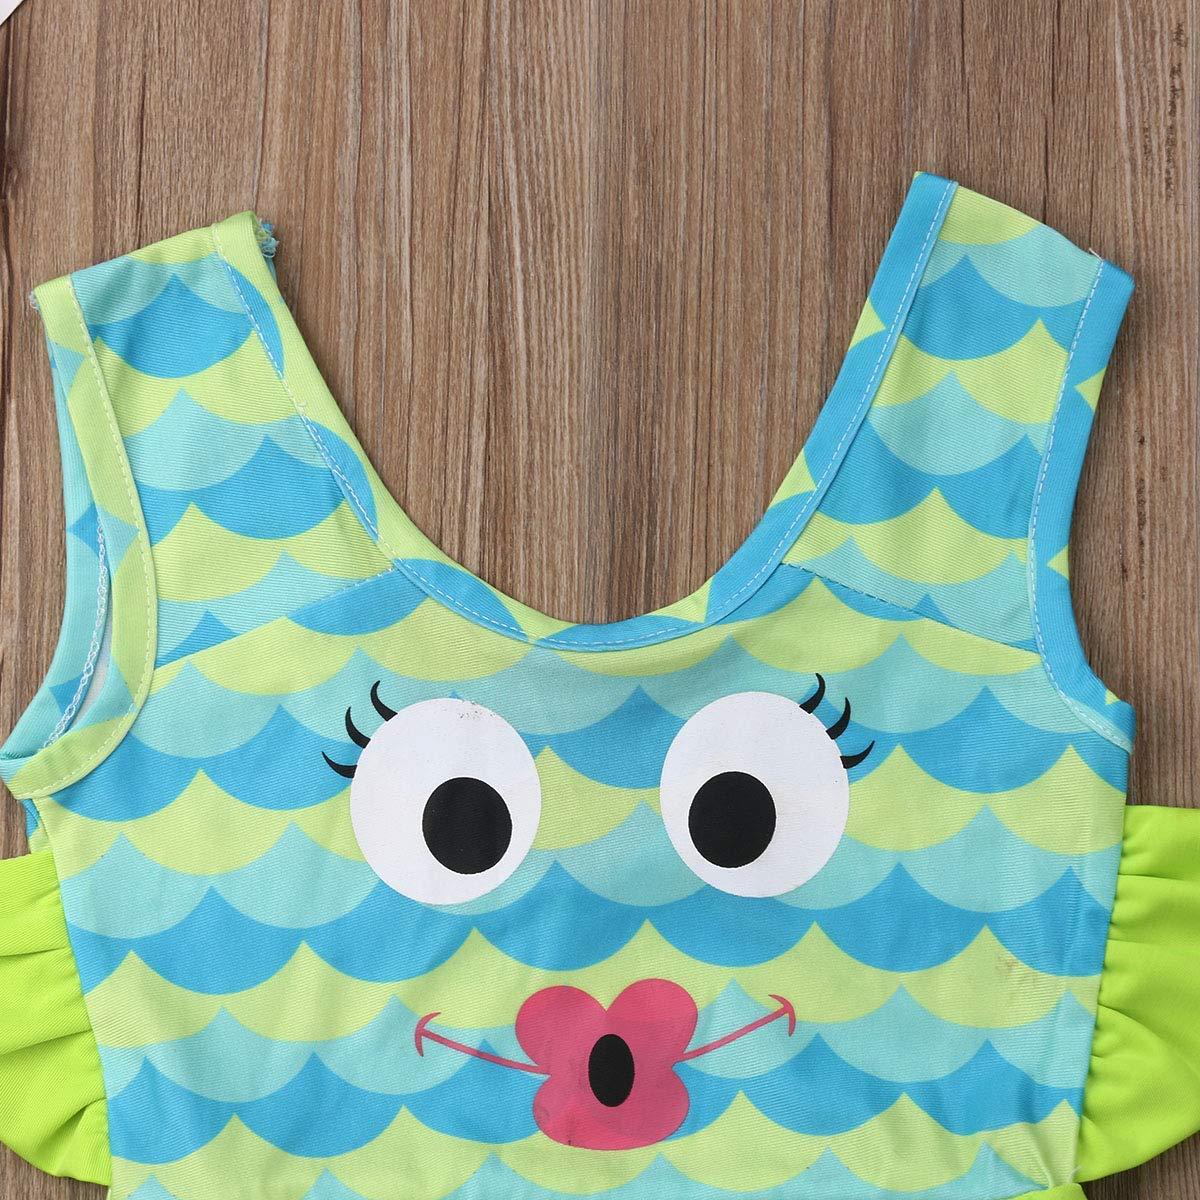 GuliriFei Swimsuit for Kids Toddler Litter Girls Swimwear Ruffle Frog Print one Piece Swimsuit